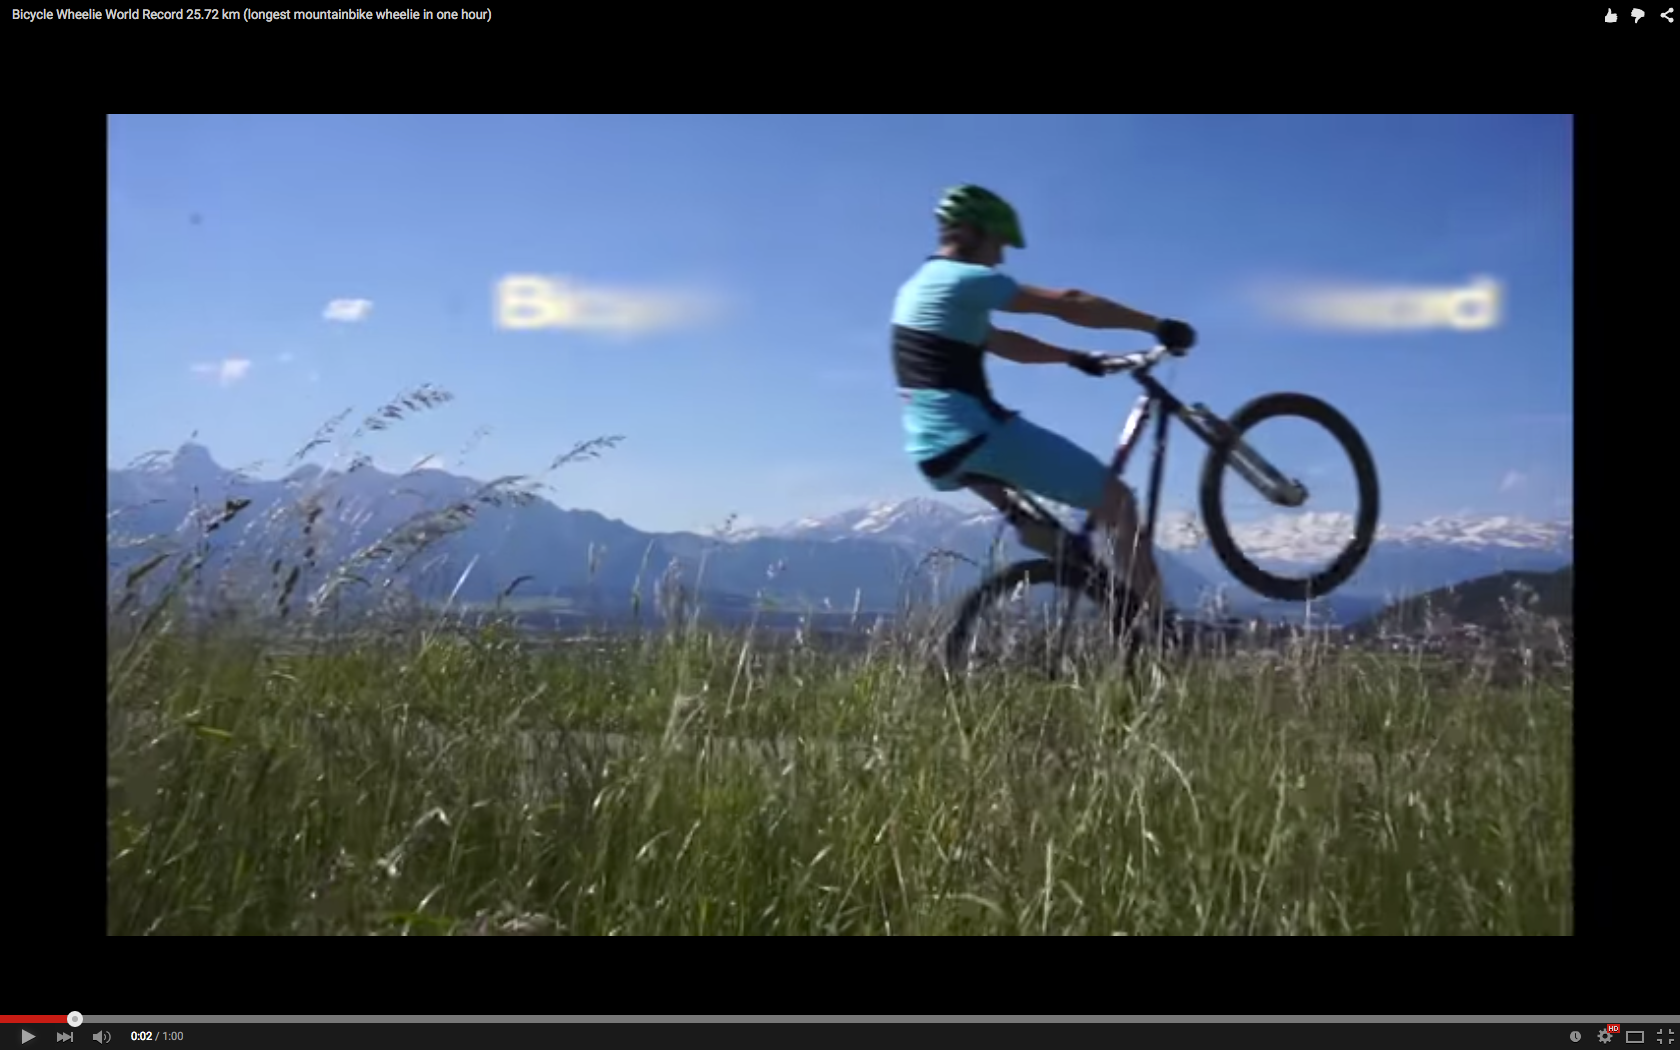 World Record Video Longest Mtb Wheelie In 1 Hour 25 72km